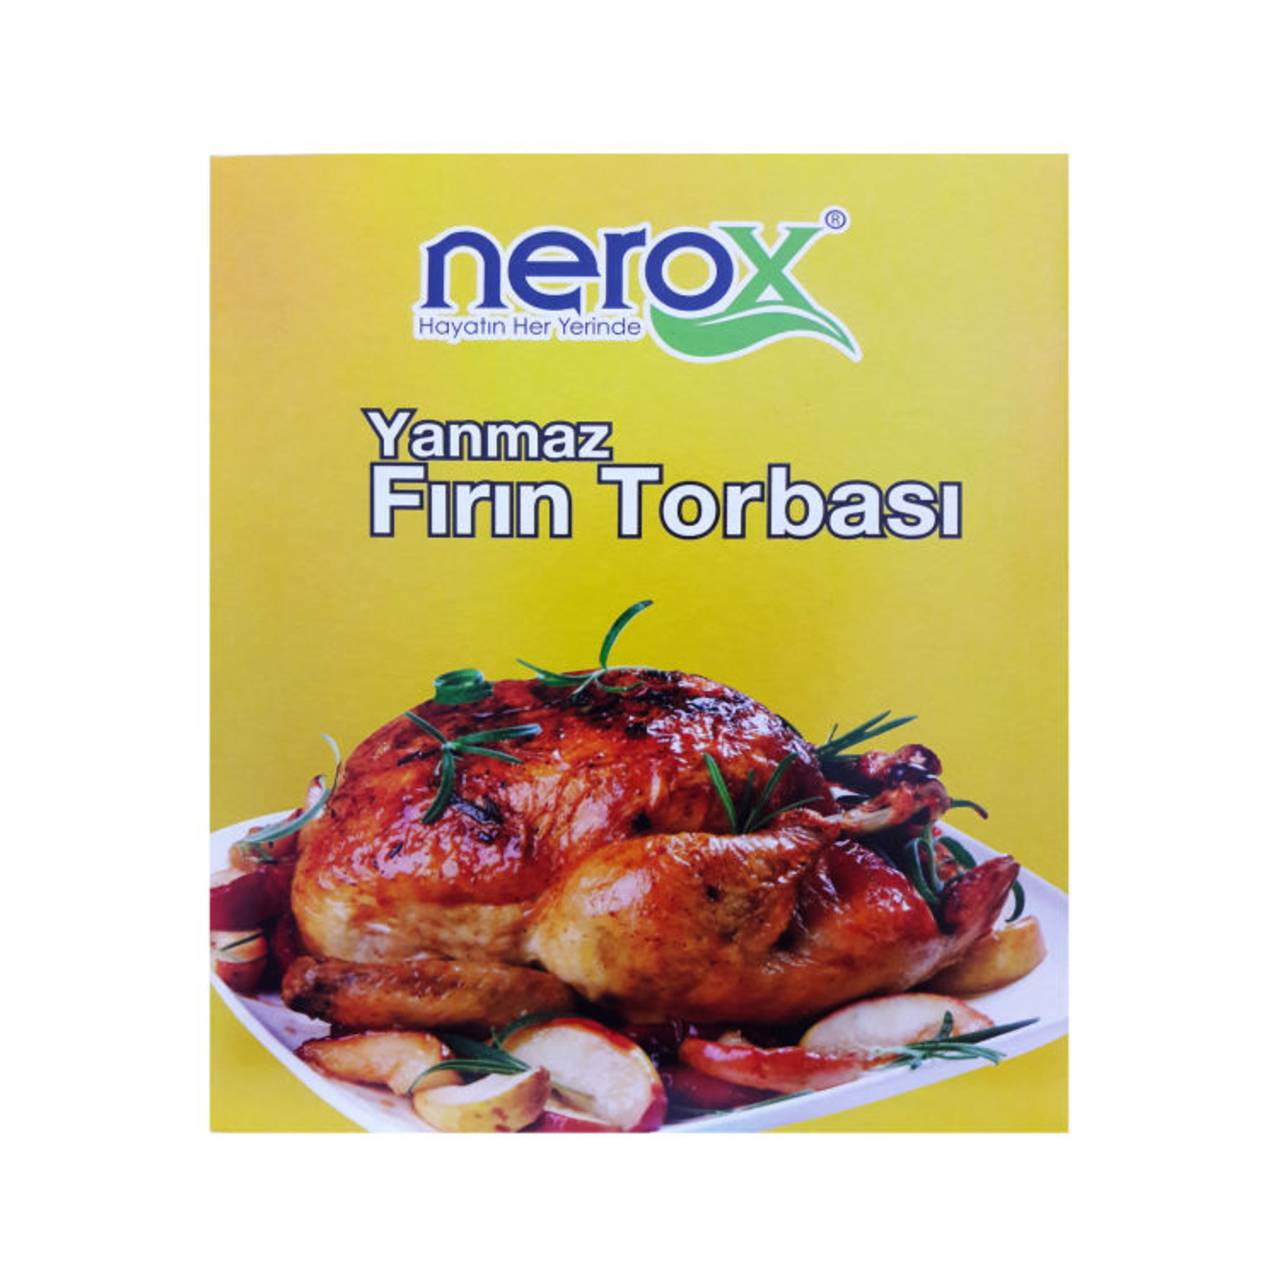 کیسه پخت نروکس Nerox